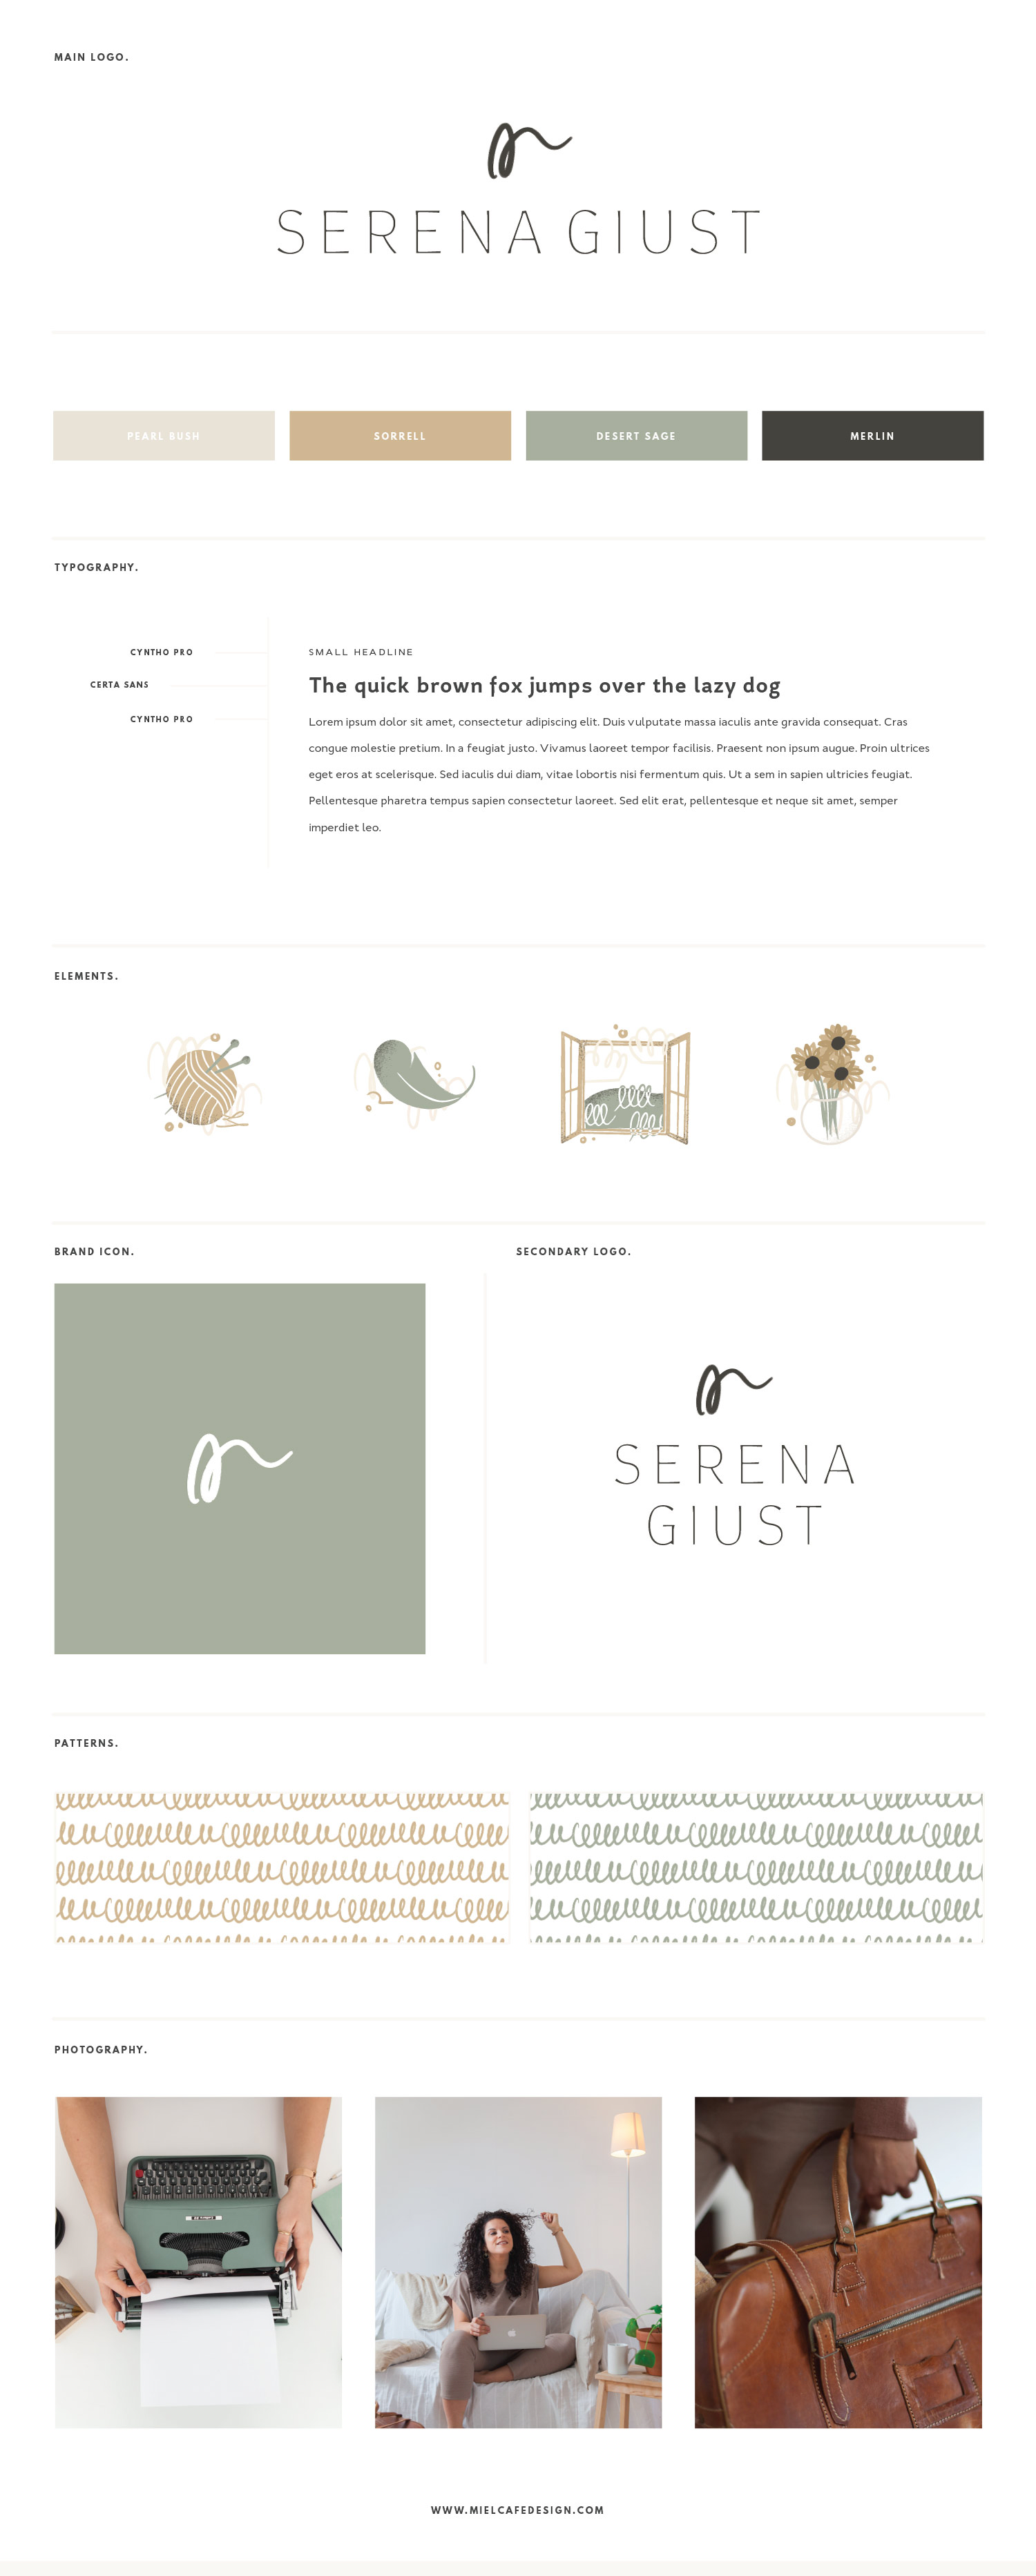 Miel Café Design Portfolio: minimal sleek Brand board for Serena Giust UX Writer